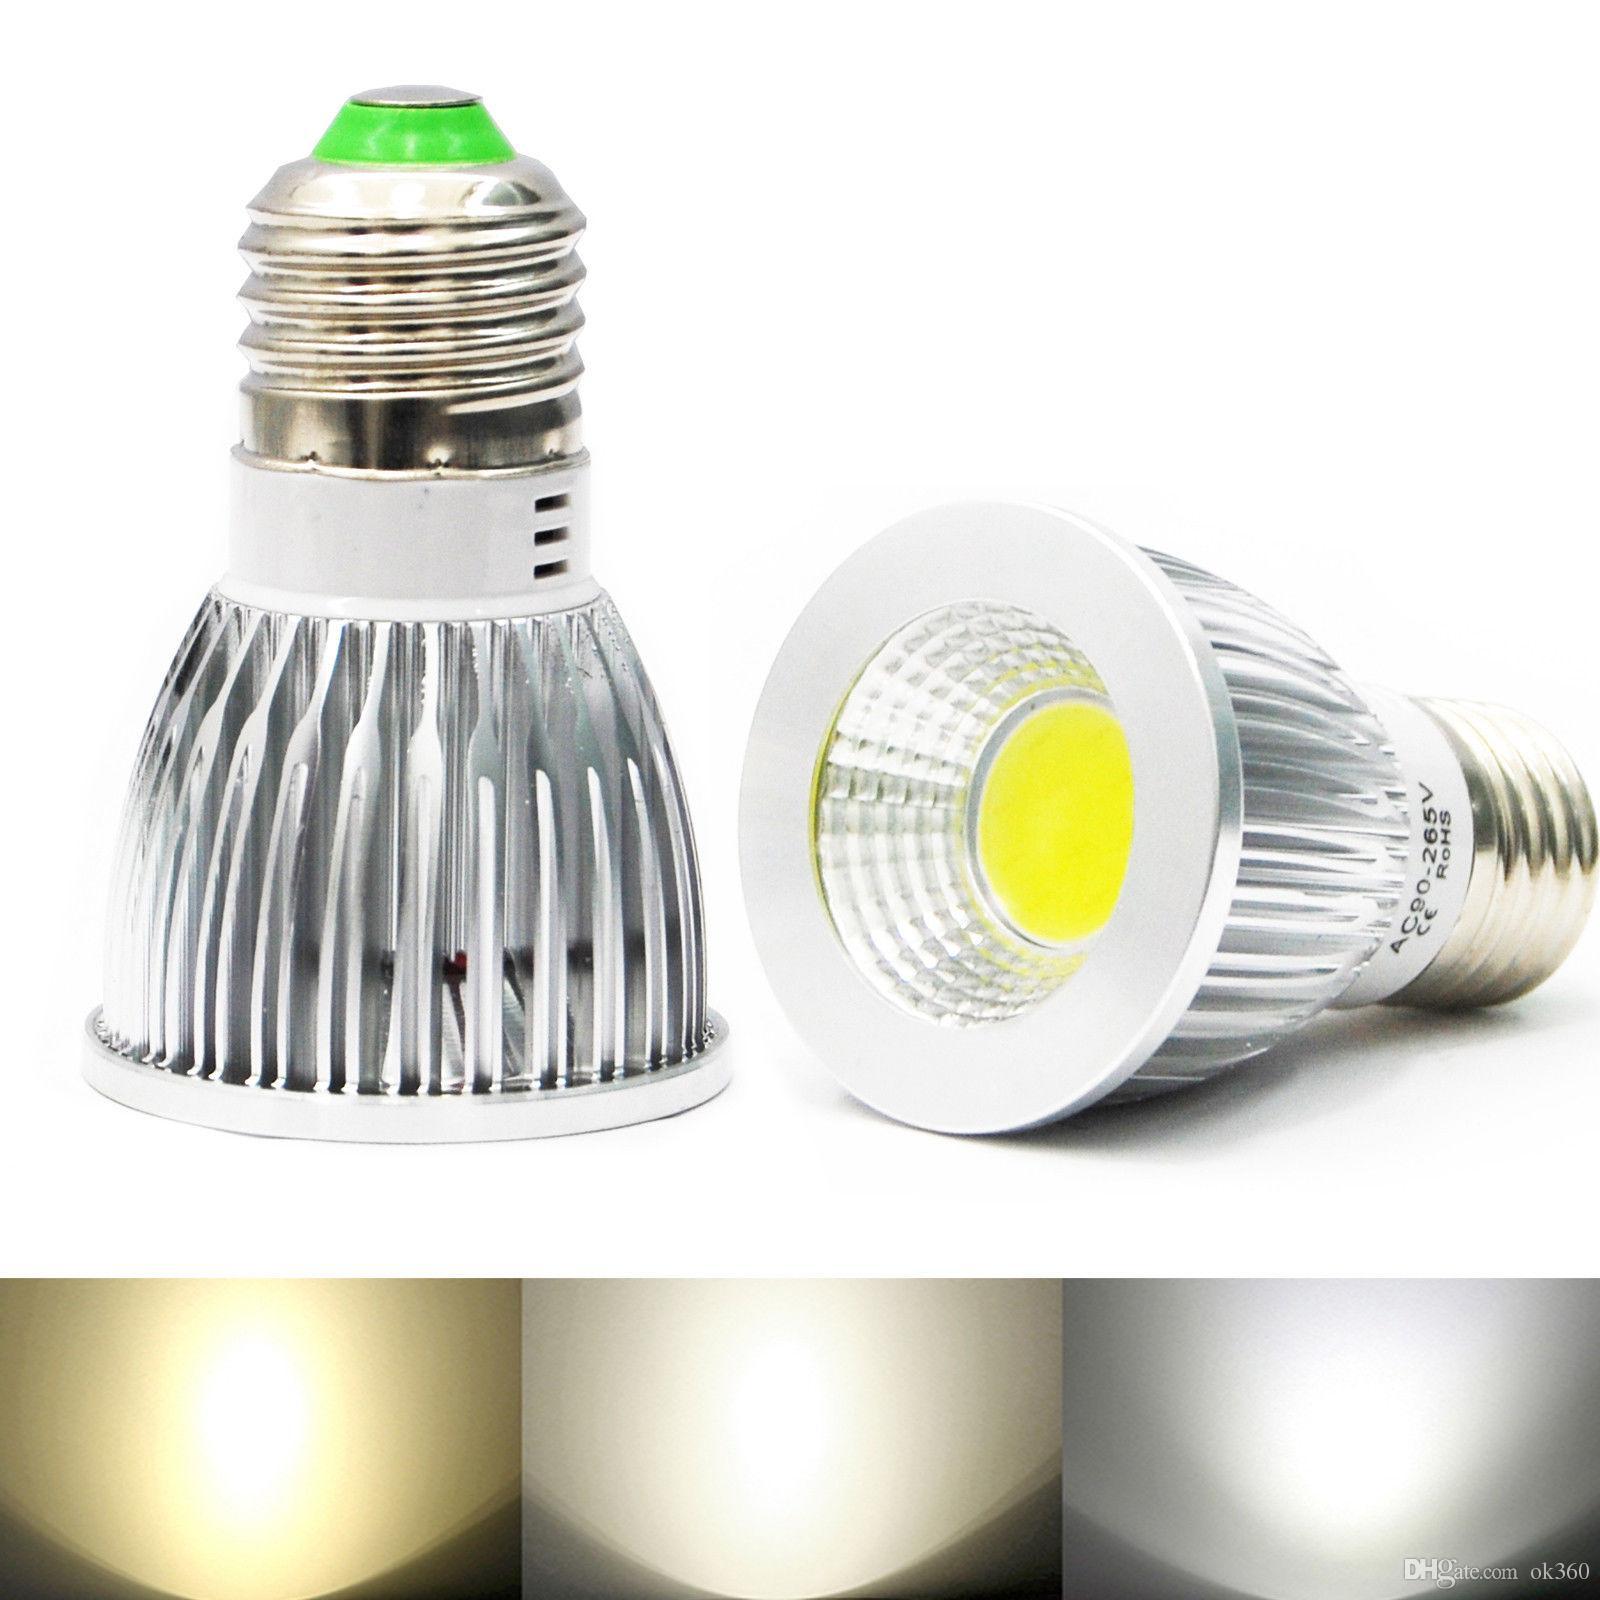 new-cob-6w-9w-12w-led-spotlights-lamp-120 Verwunderlich Led Gu10 Dimmbar 120 Dekorationen